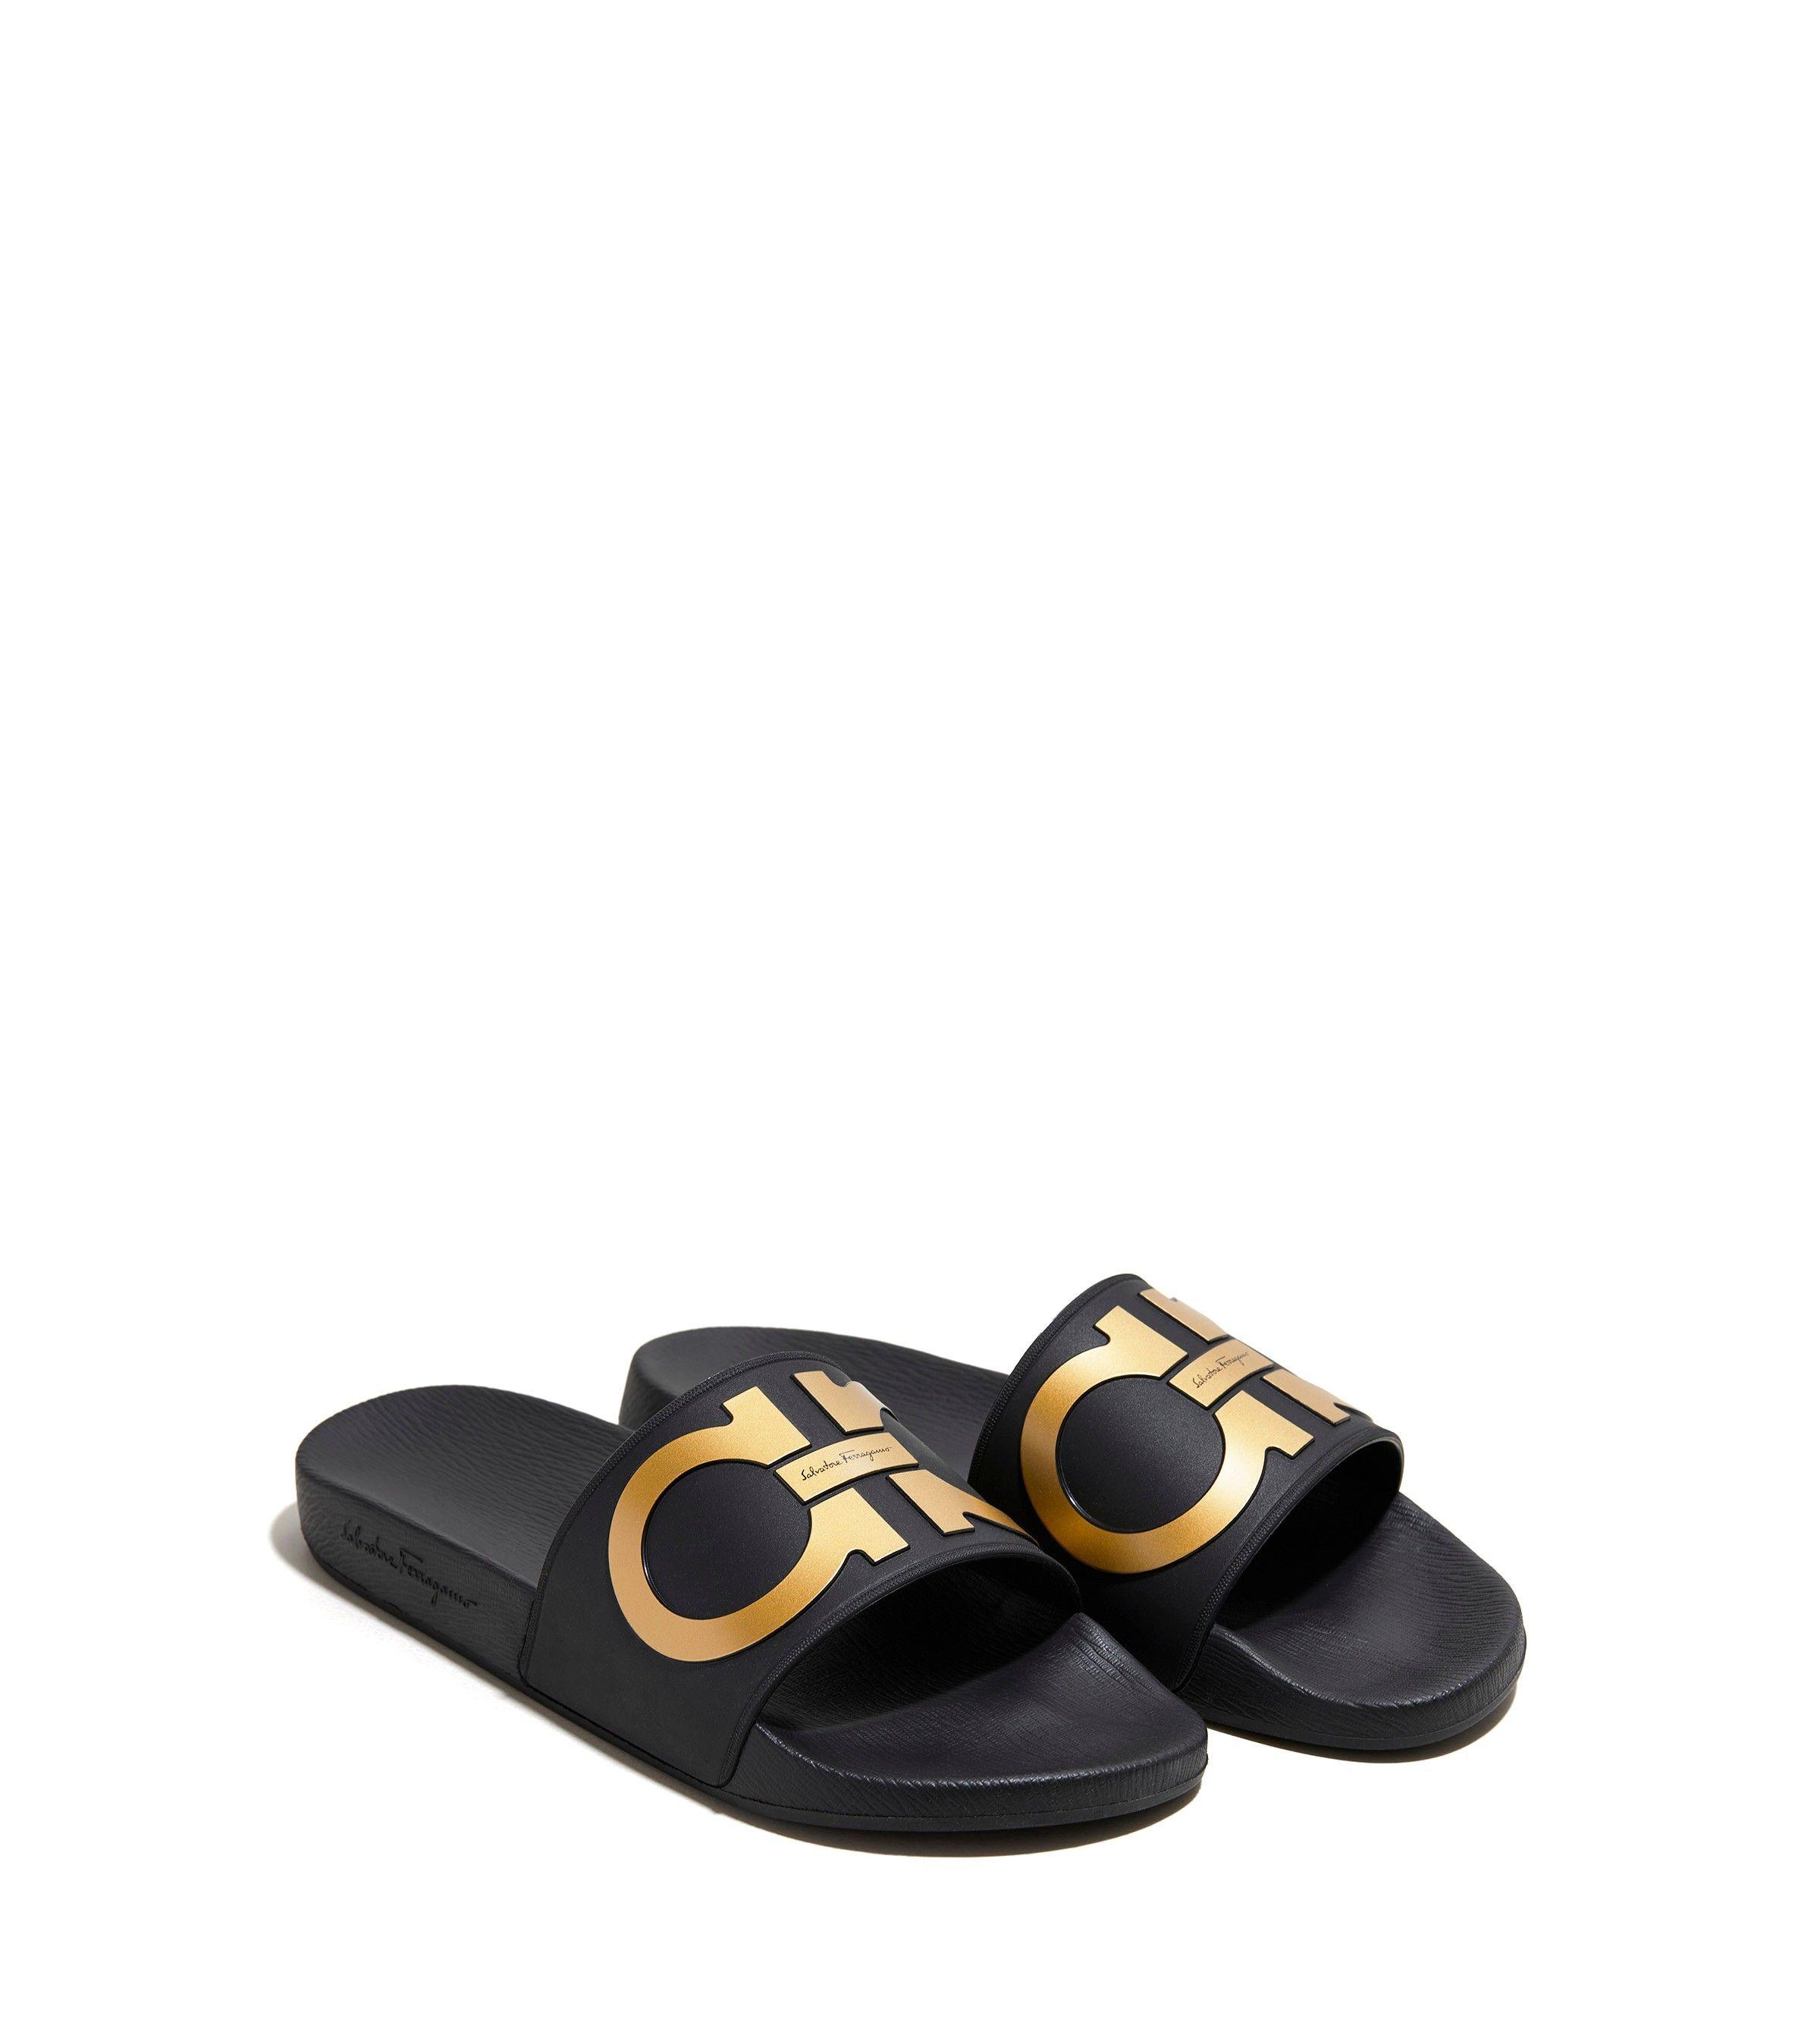 ce6768dfd2f Salvatore ferragamo gancini pool slide sandal shoes jpg 2400x2683 Pool  ferragamo sandals